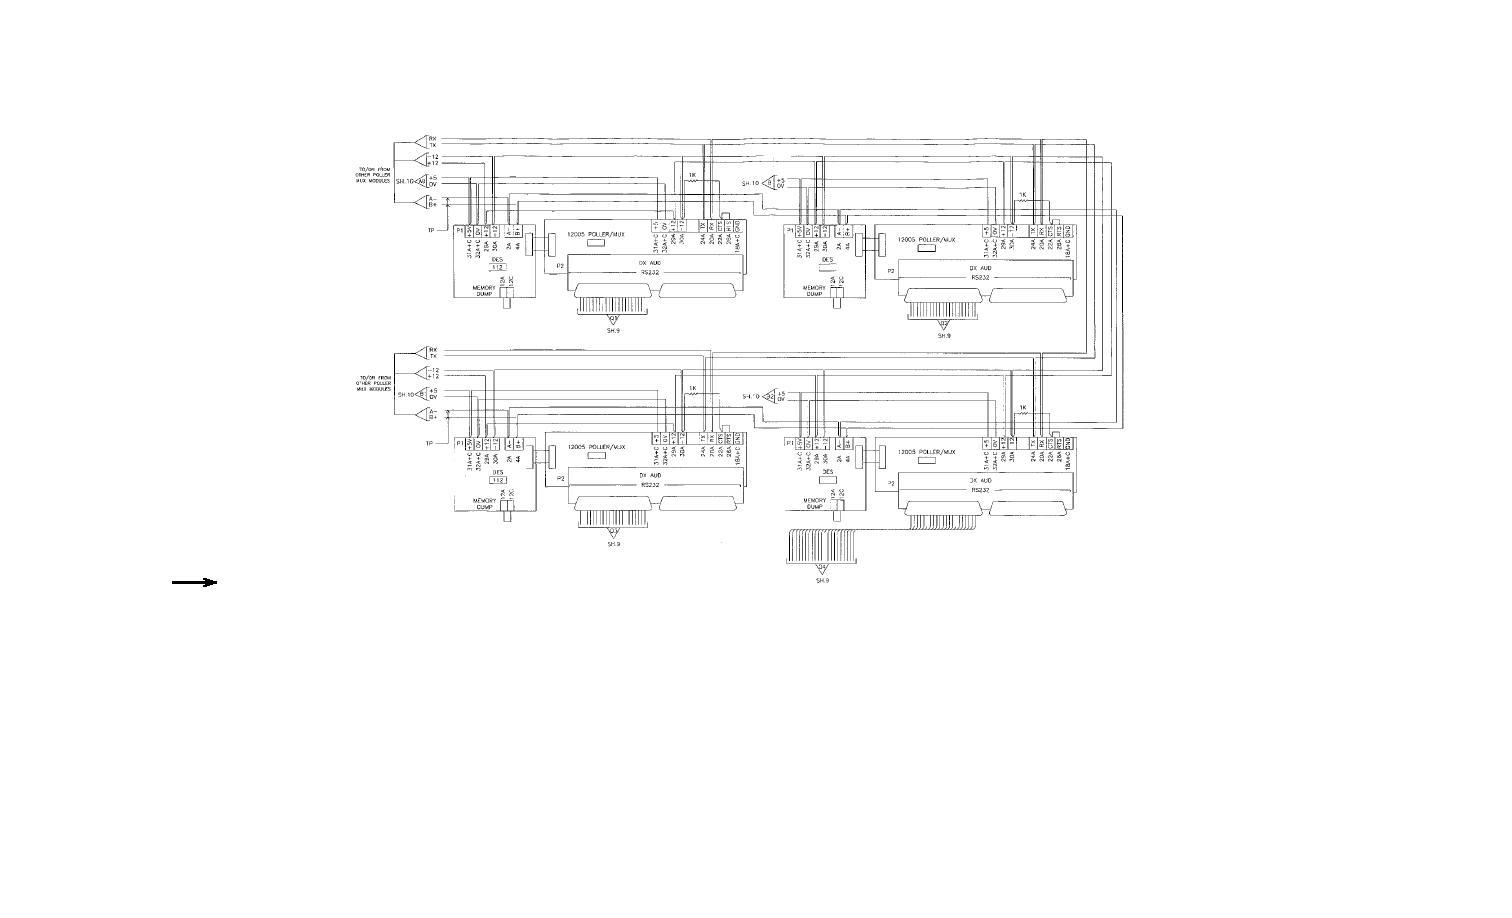 Fo 2 Pmc Functional Wiring Block Diagram Sheet 6 Of 11